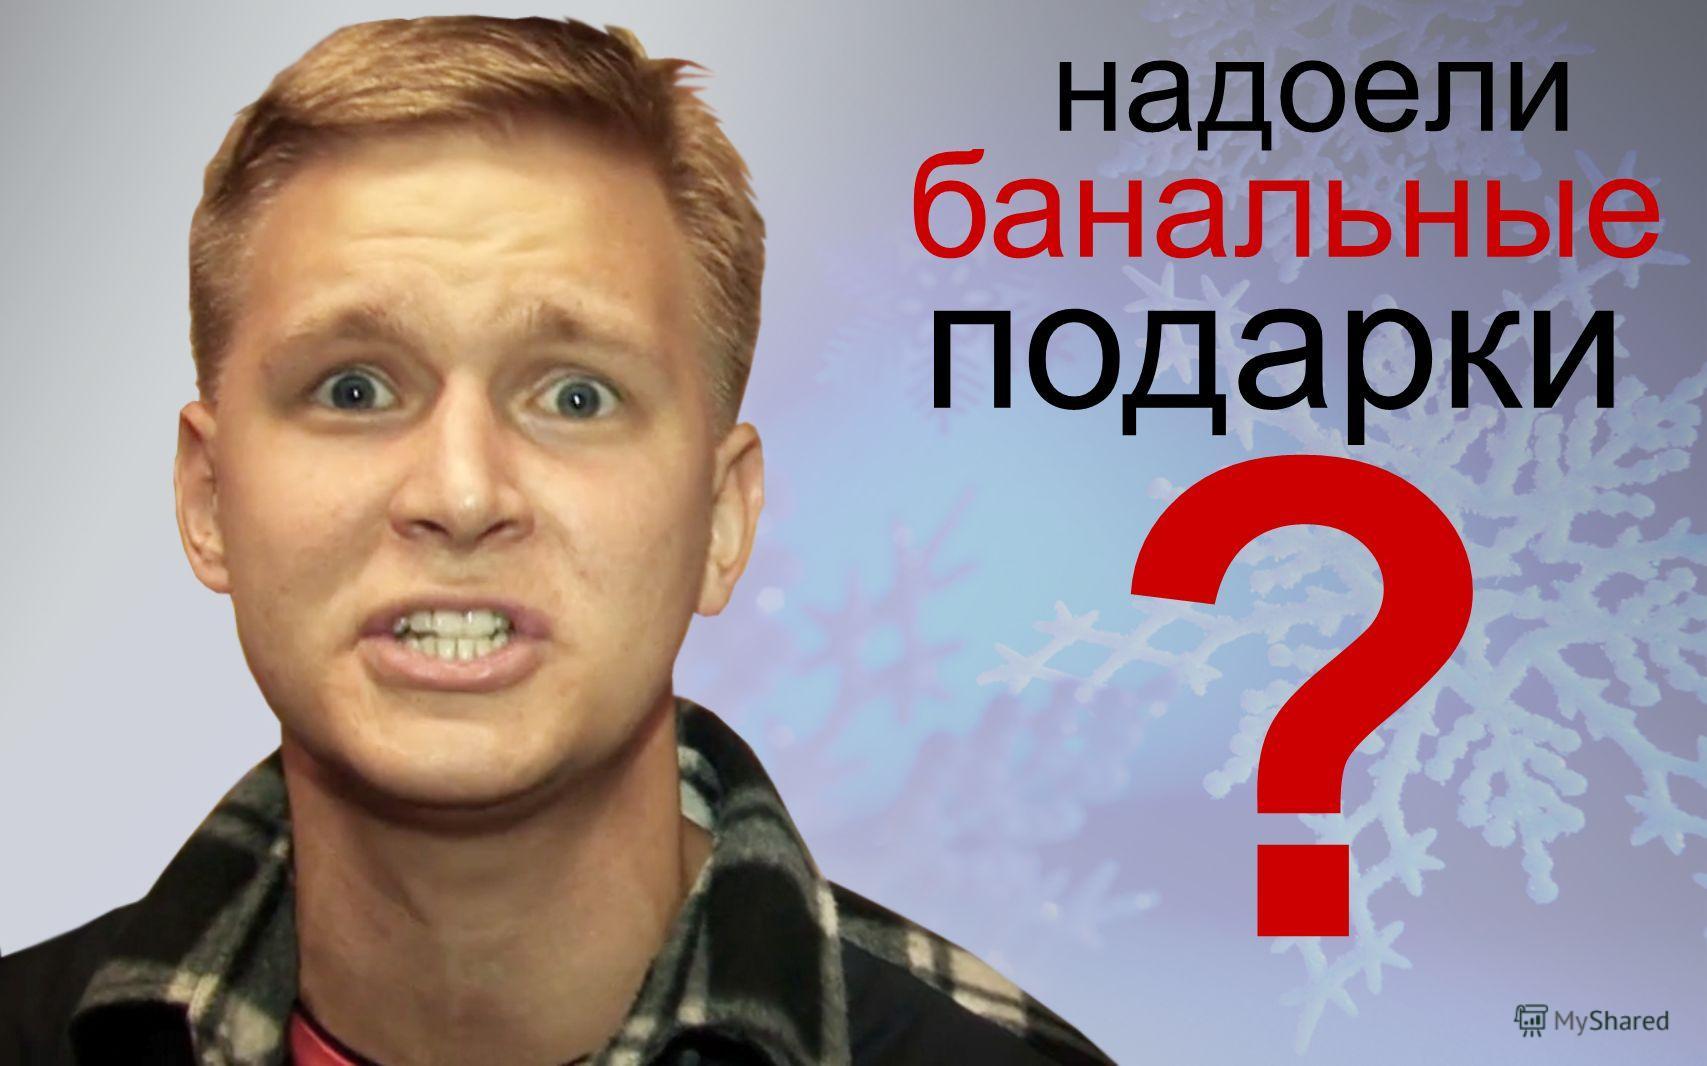 www.telesys.ru